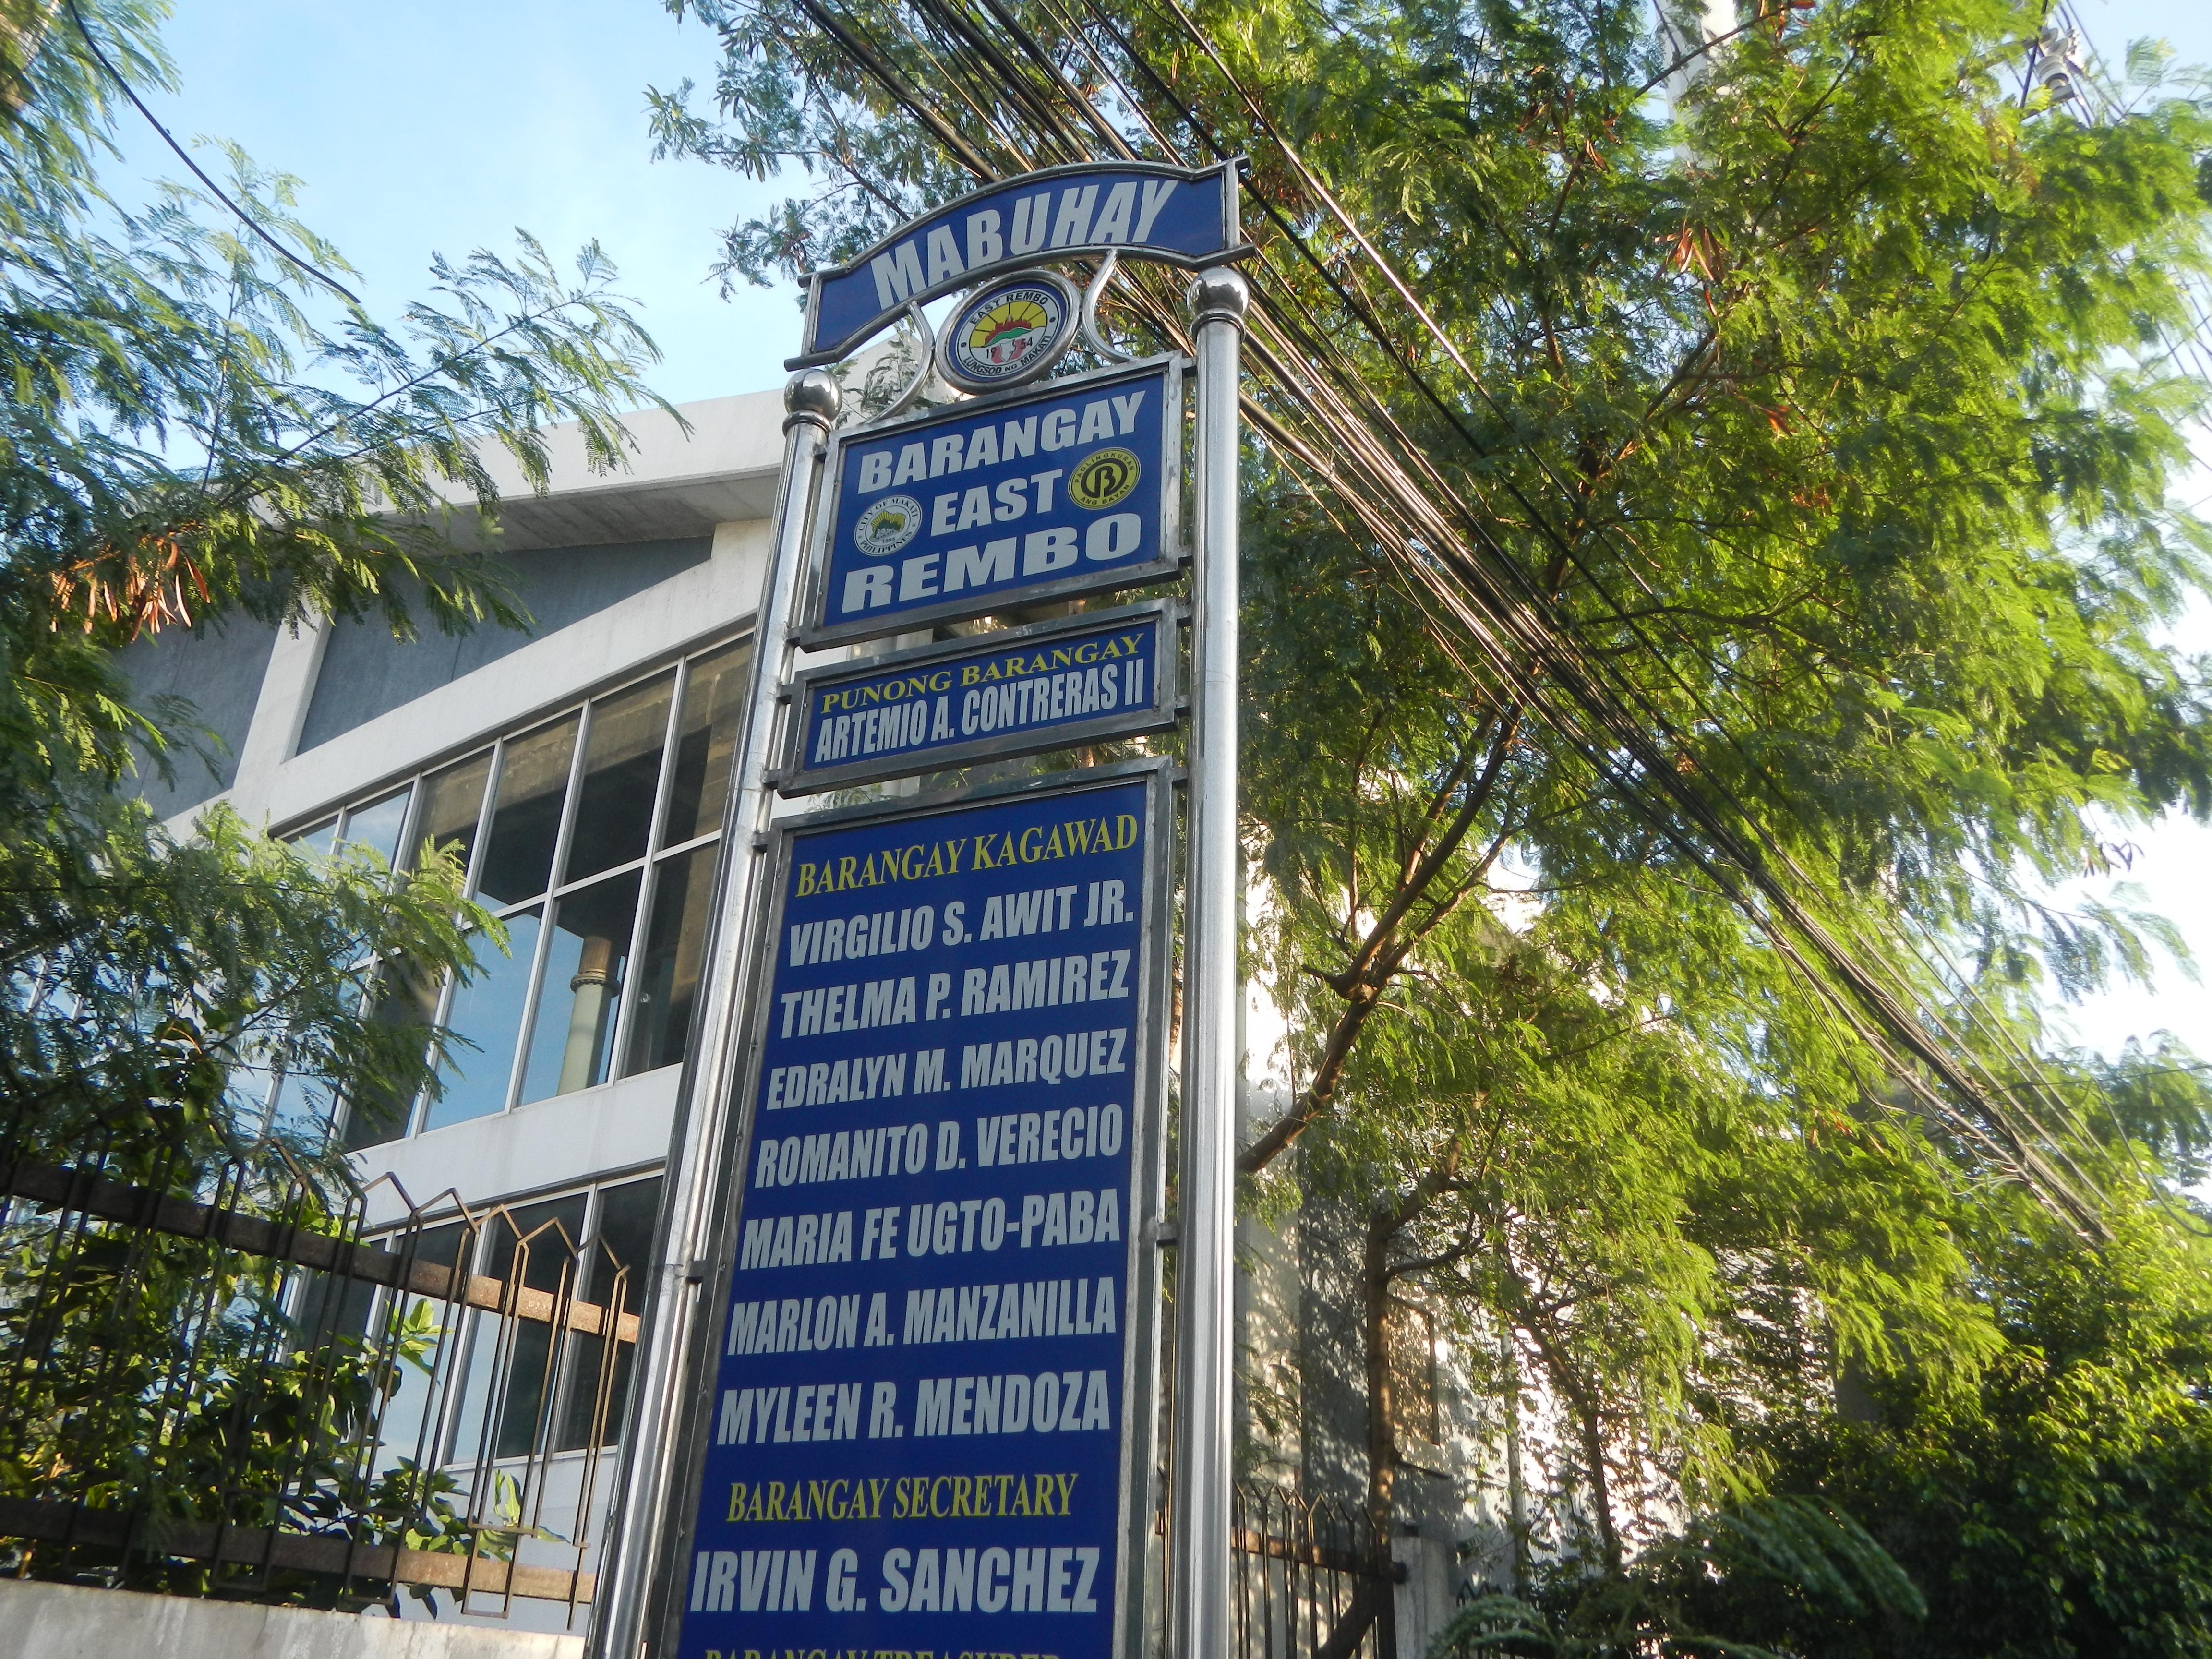 File:03583jfOld Trees Footbridges Makati Park Garden West Rembo, Makati  Cityfvf 26